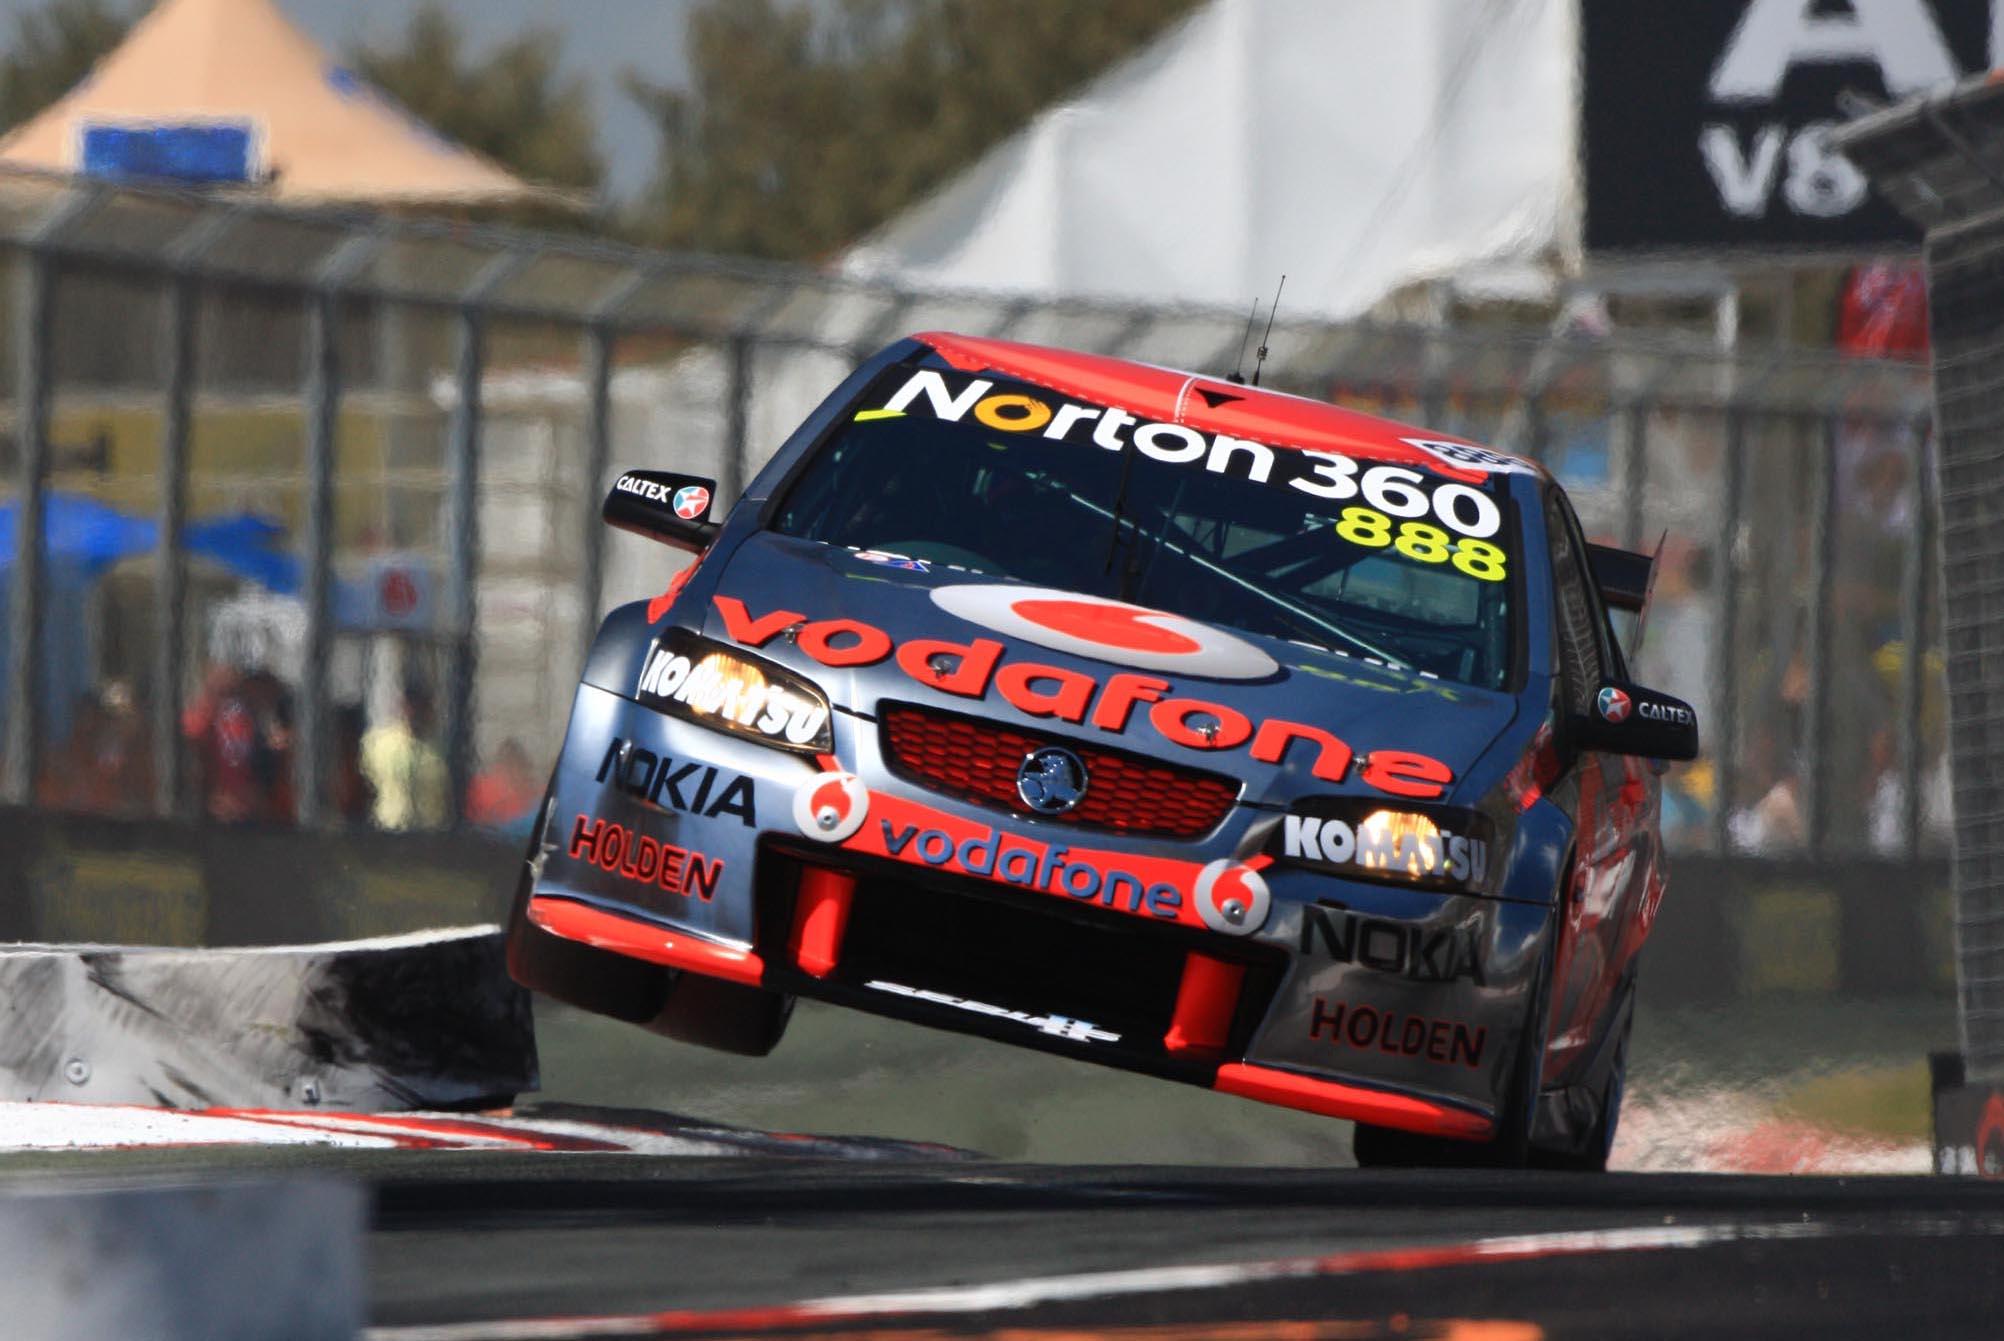 Aussie V8 Supercars race racing v 8 jt wallpaper 2004x1341